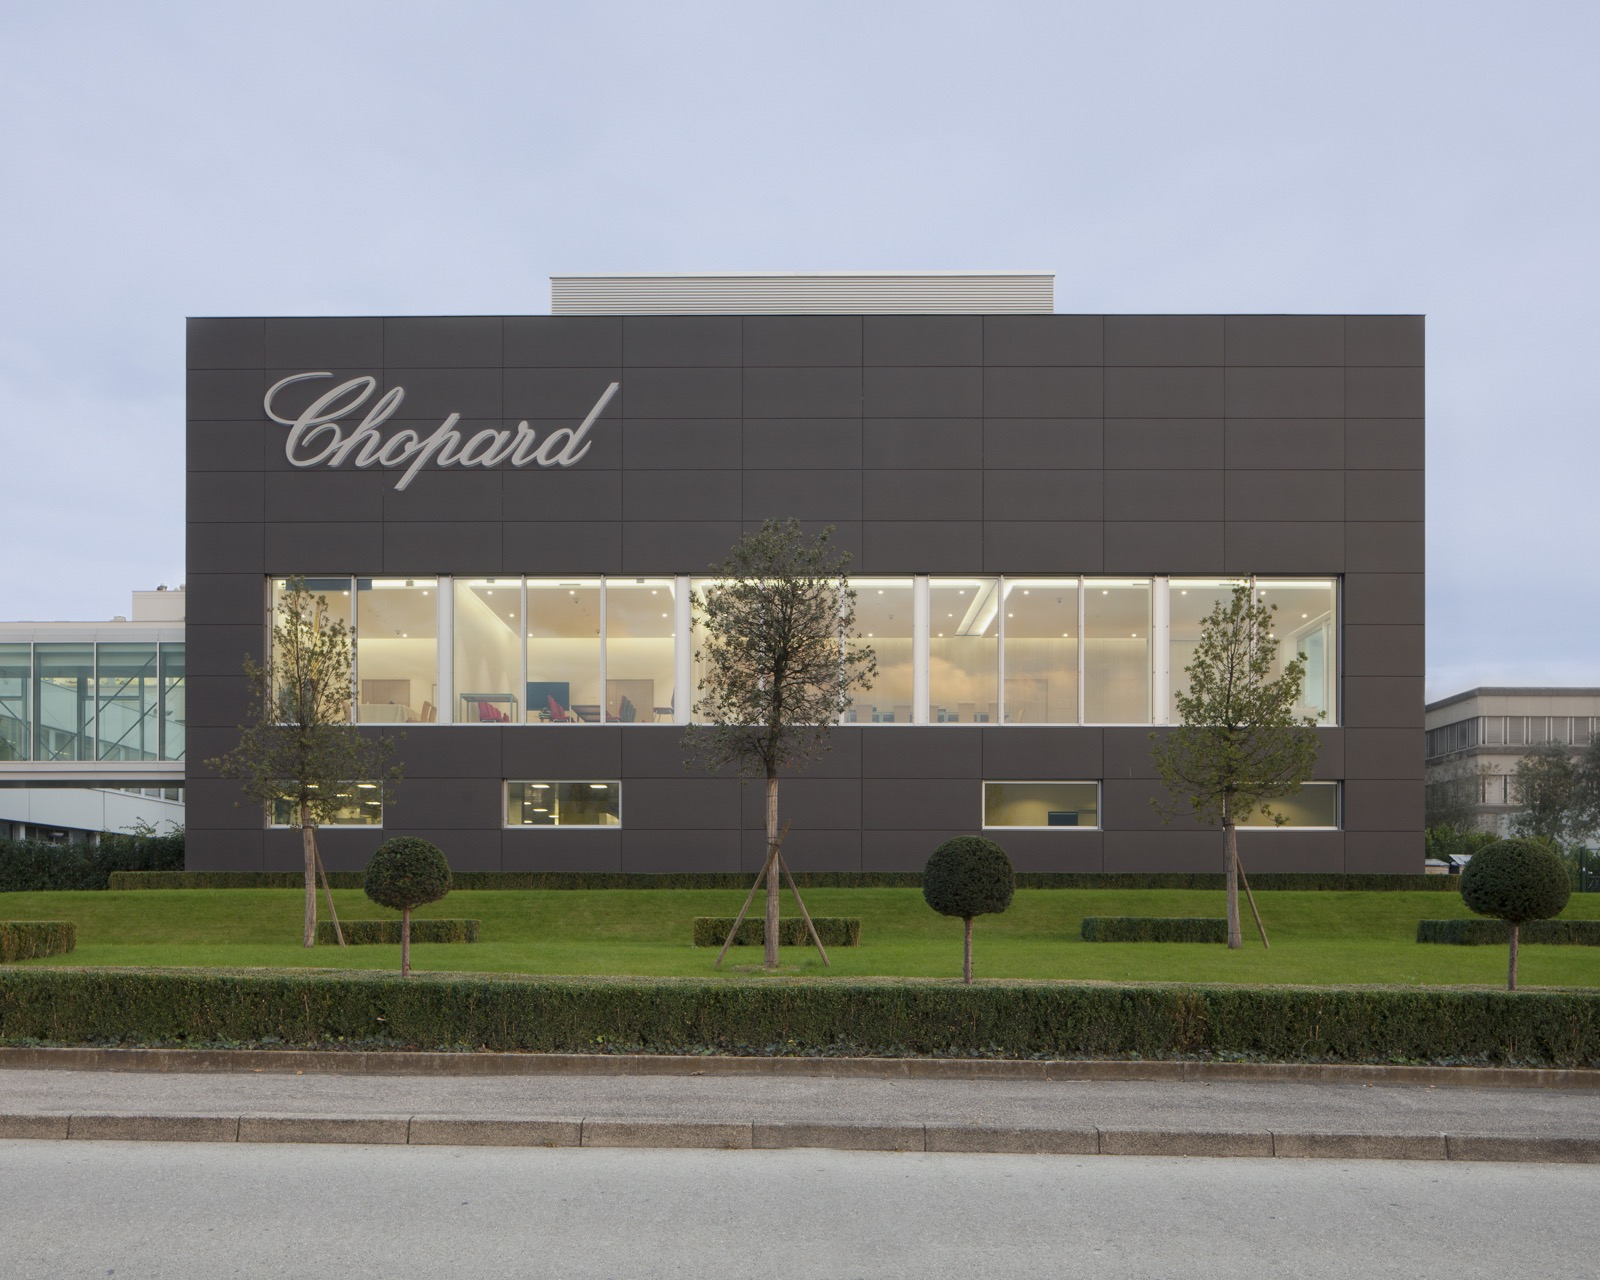 Chopard Headquaters Meyrin 1